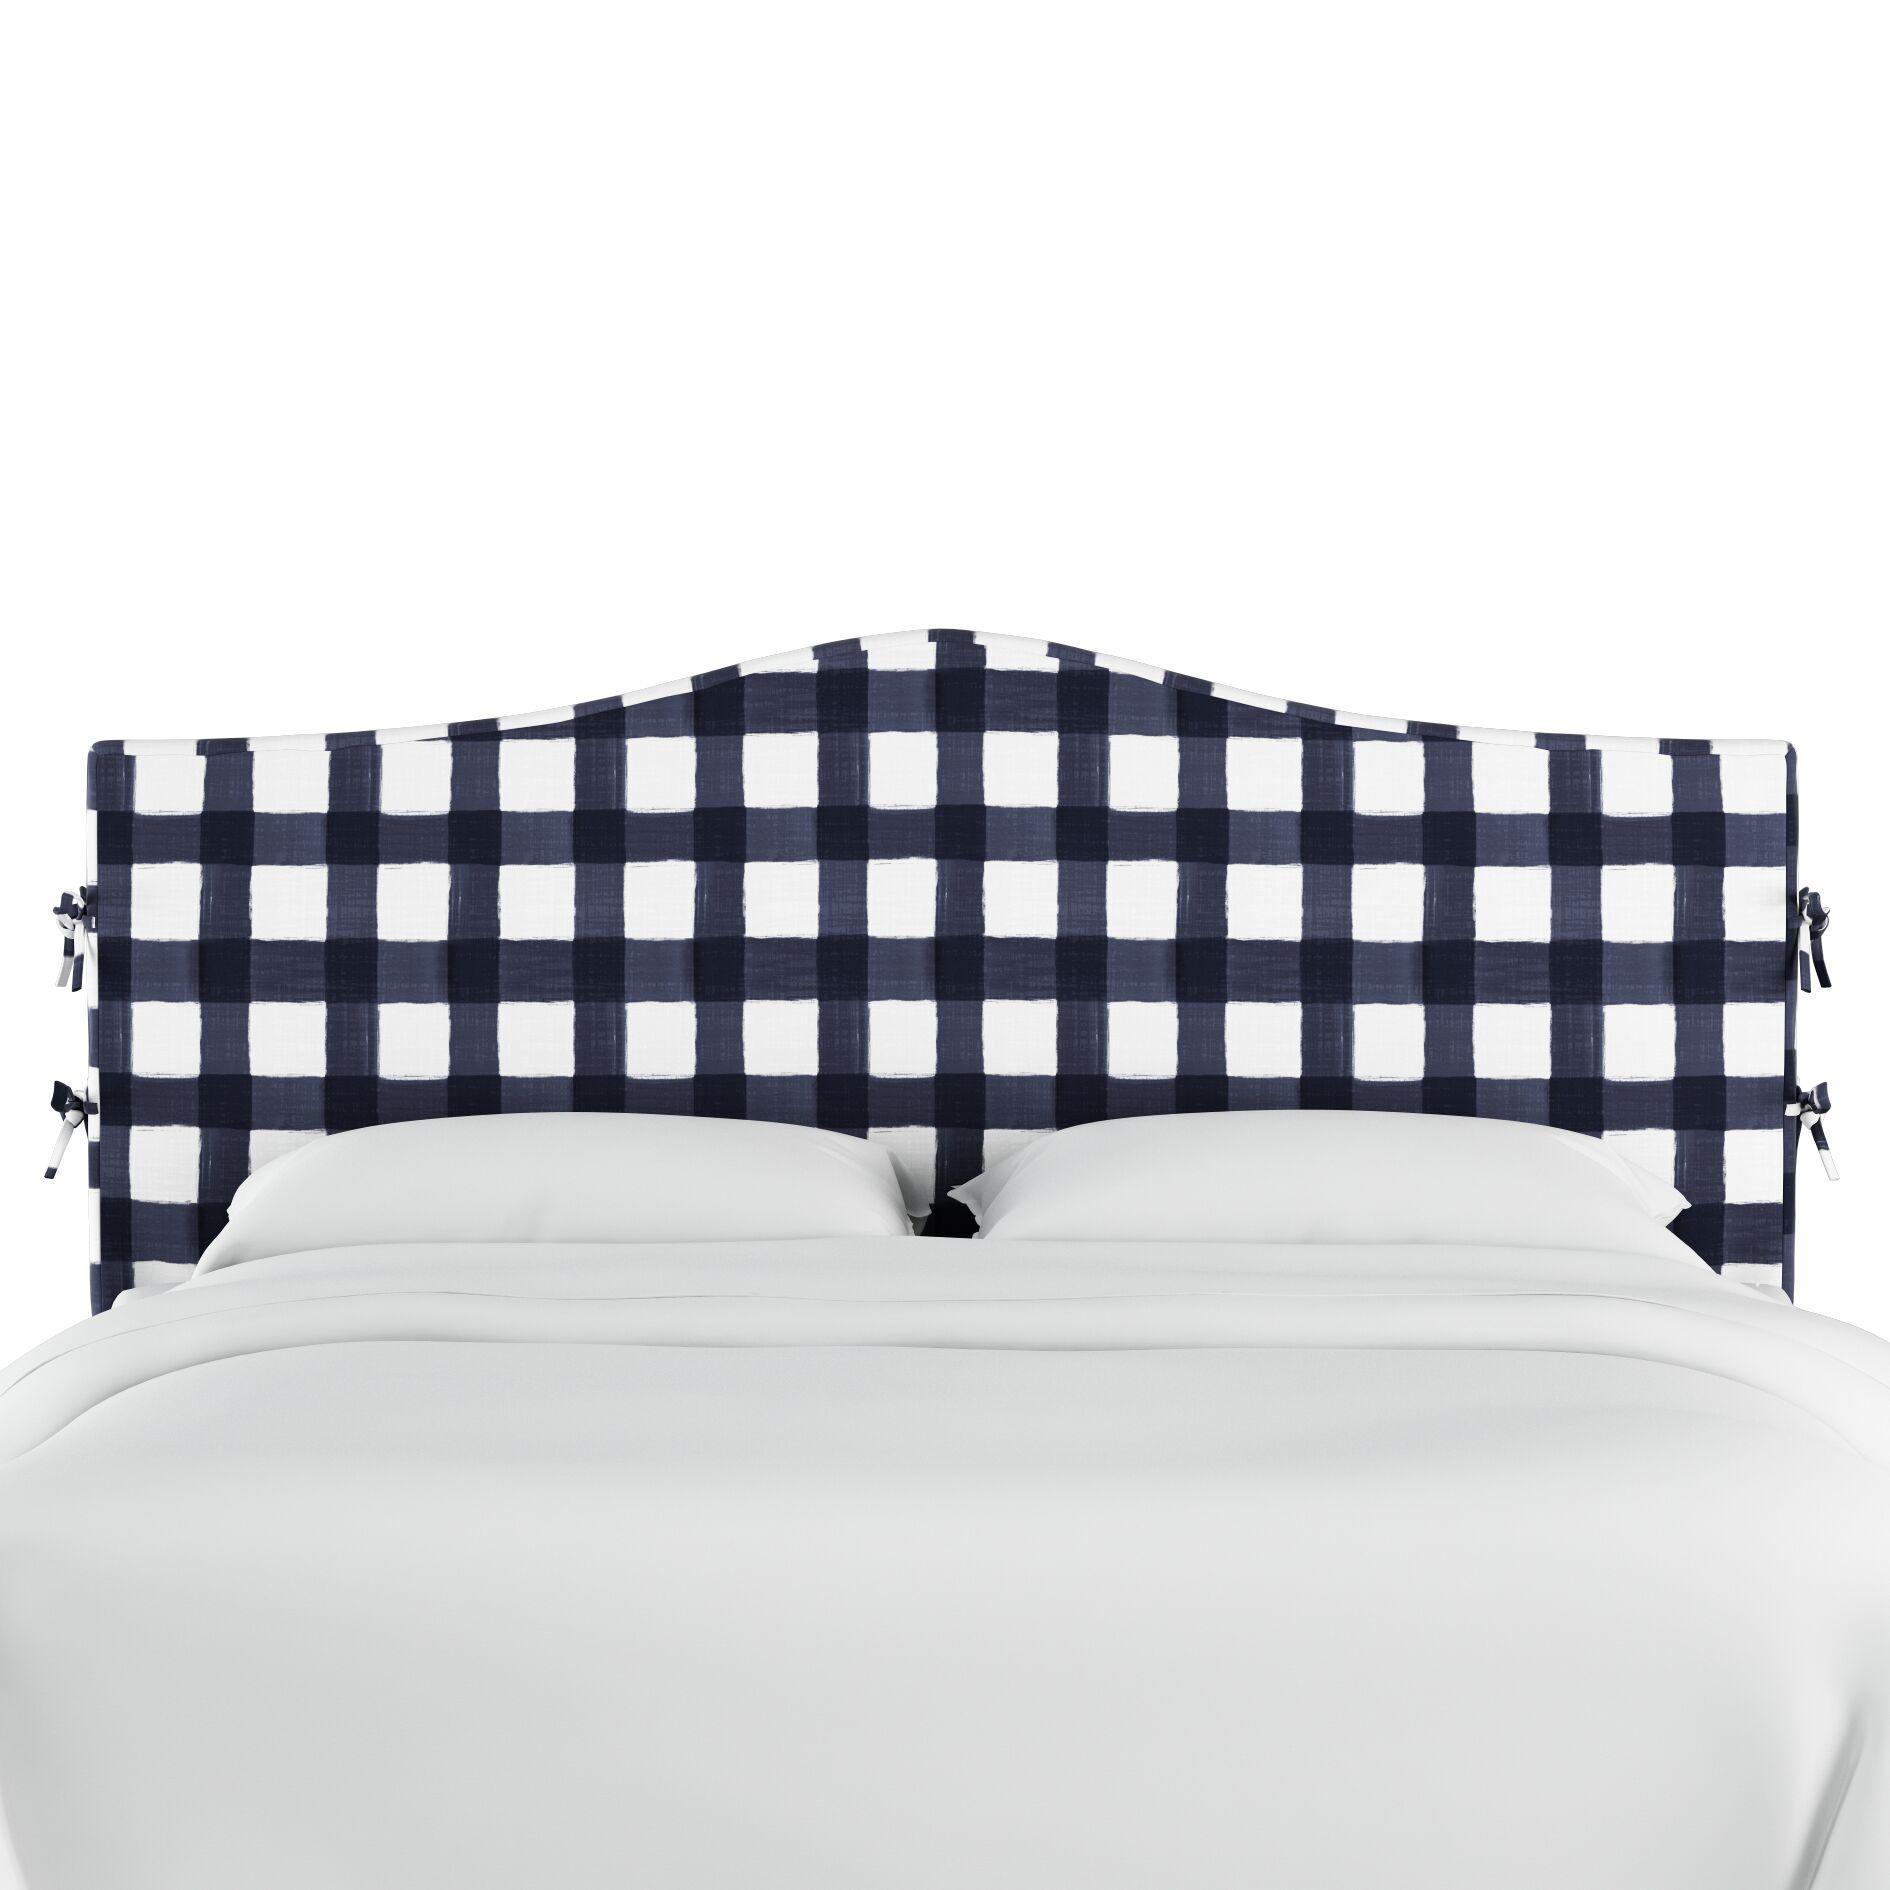 Linnet Linen Upholstered Panel Headboard Size: Queen, Color: Blue